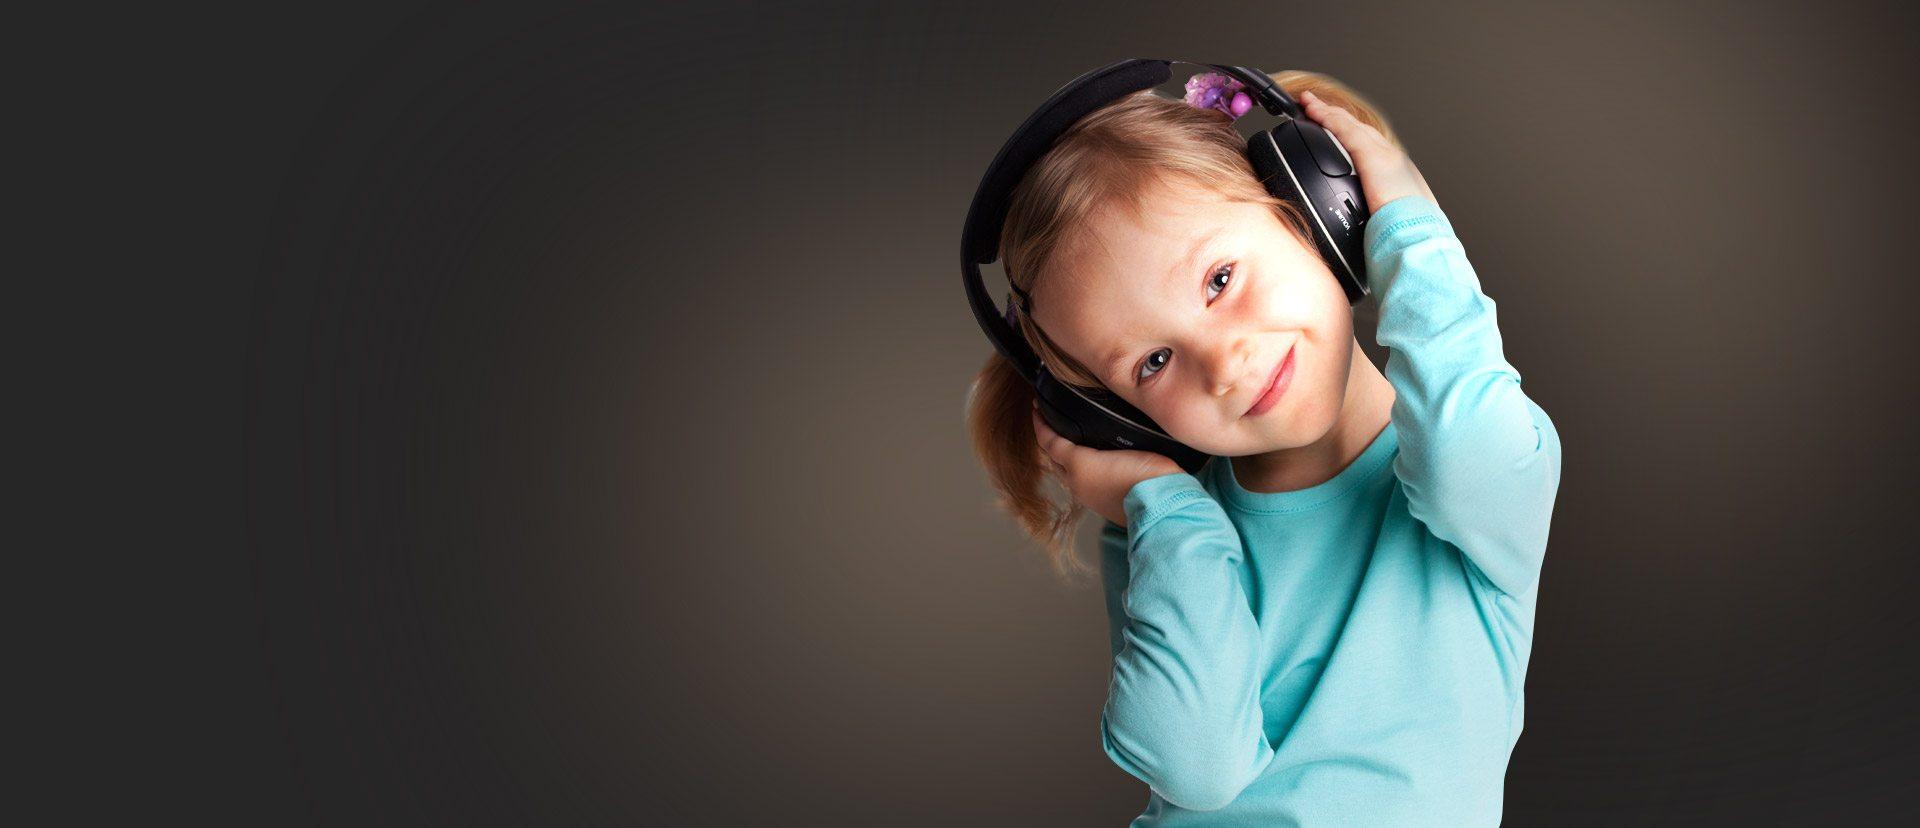 Audio Art